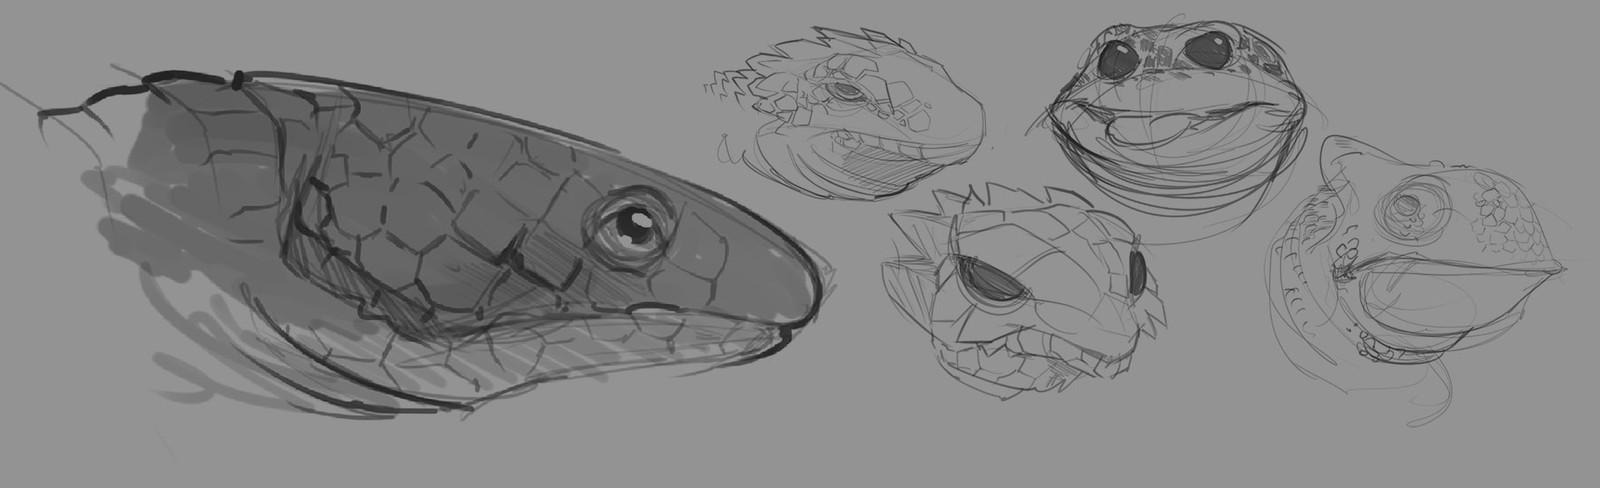 Lizard studies for Godzilla creature treatment